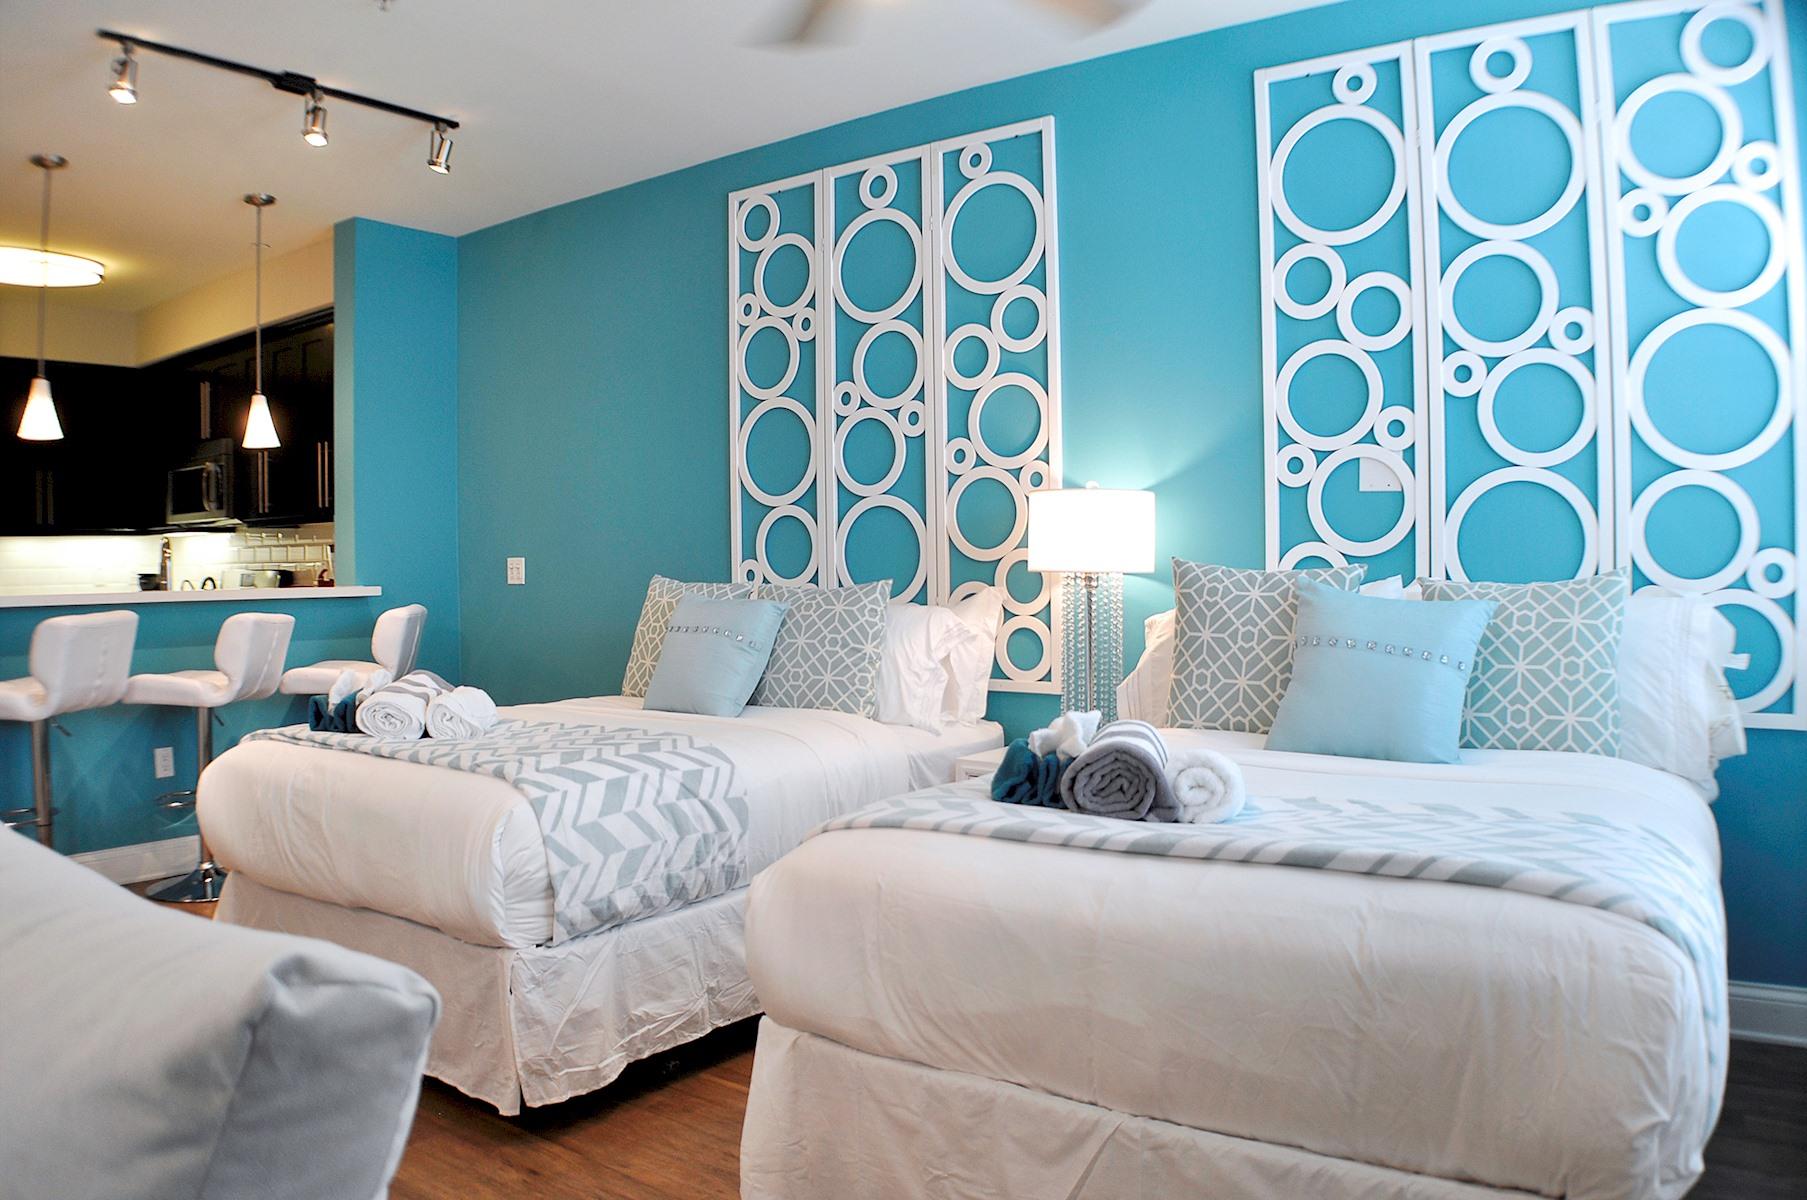 103 · Luxury Hollywood 4 beds Studio + pool free parking photo 20316411